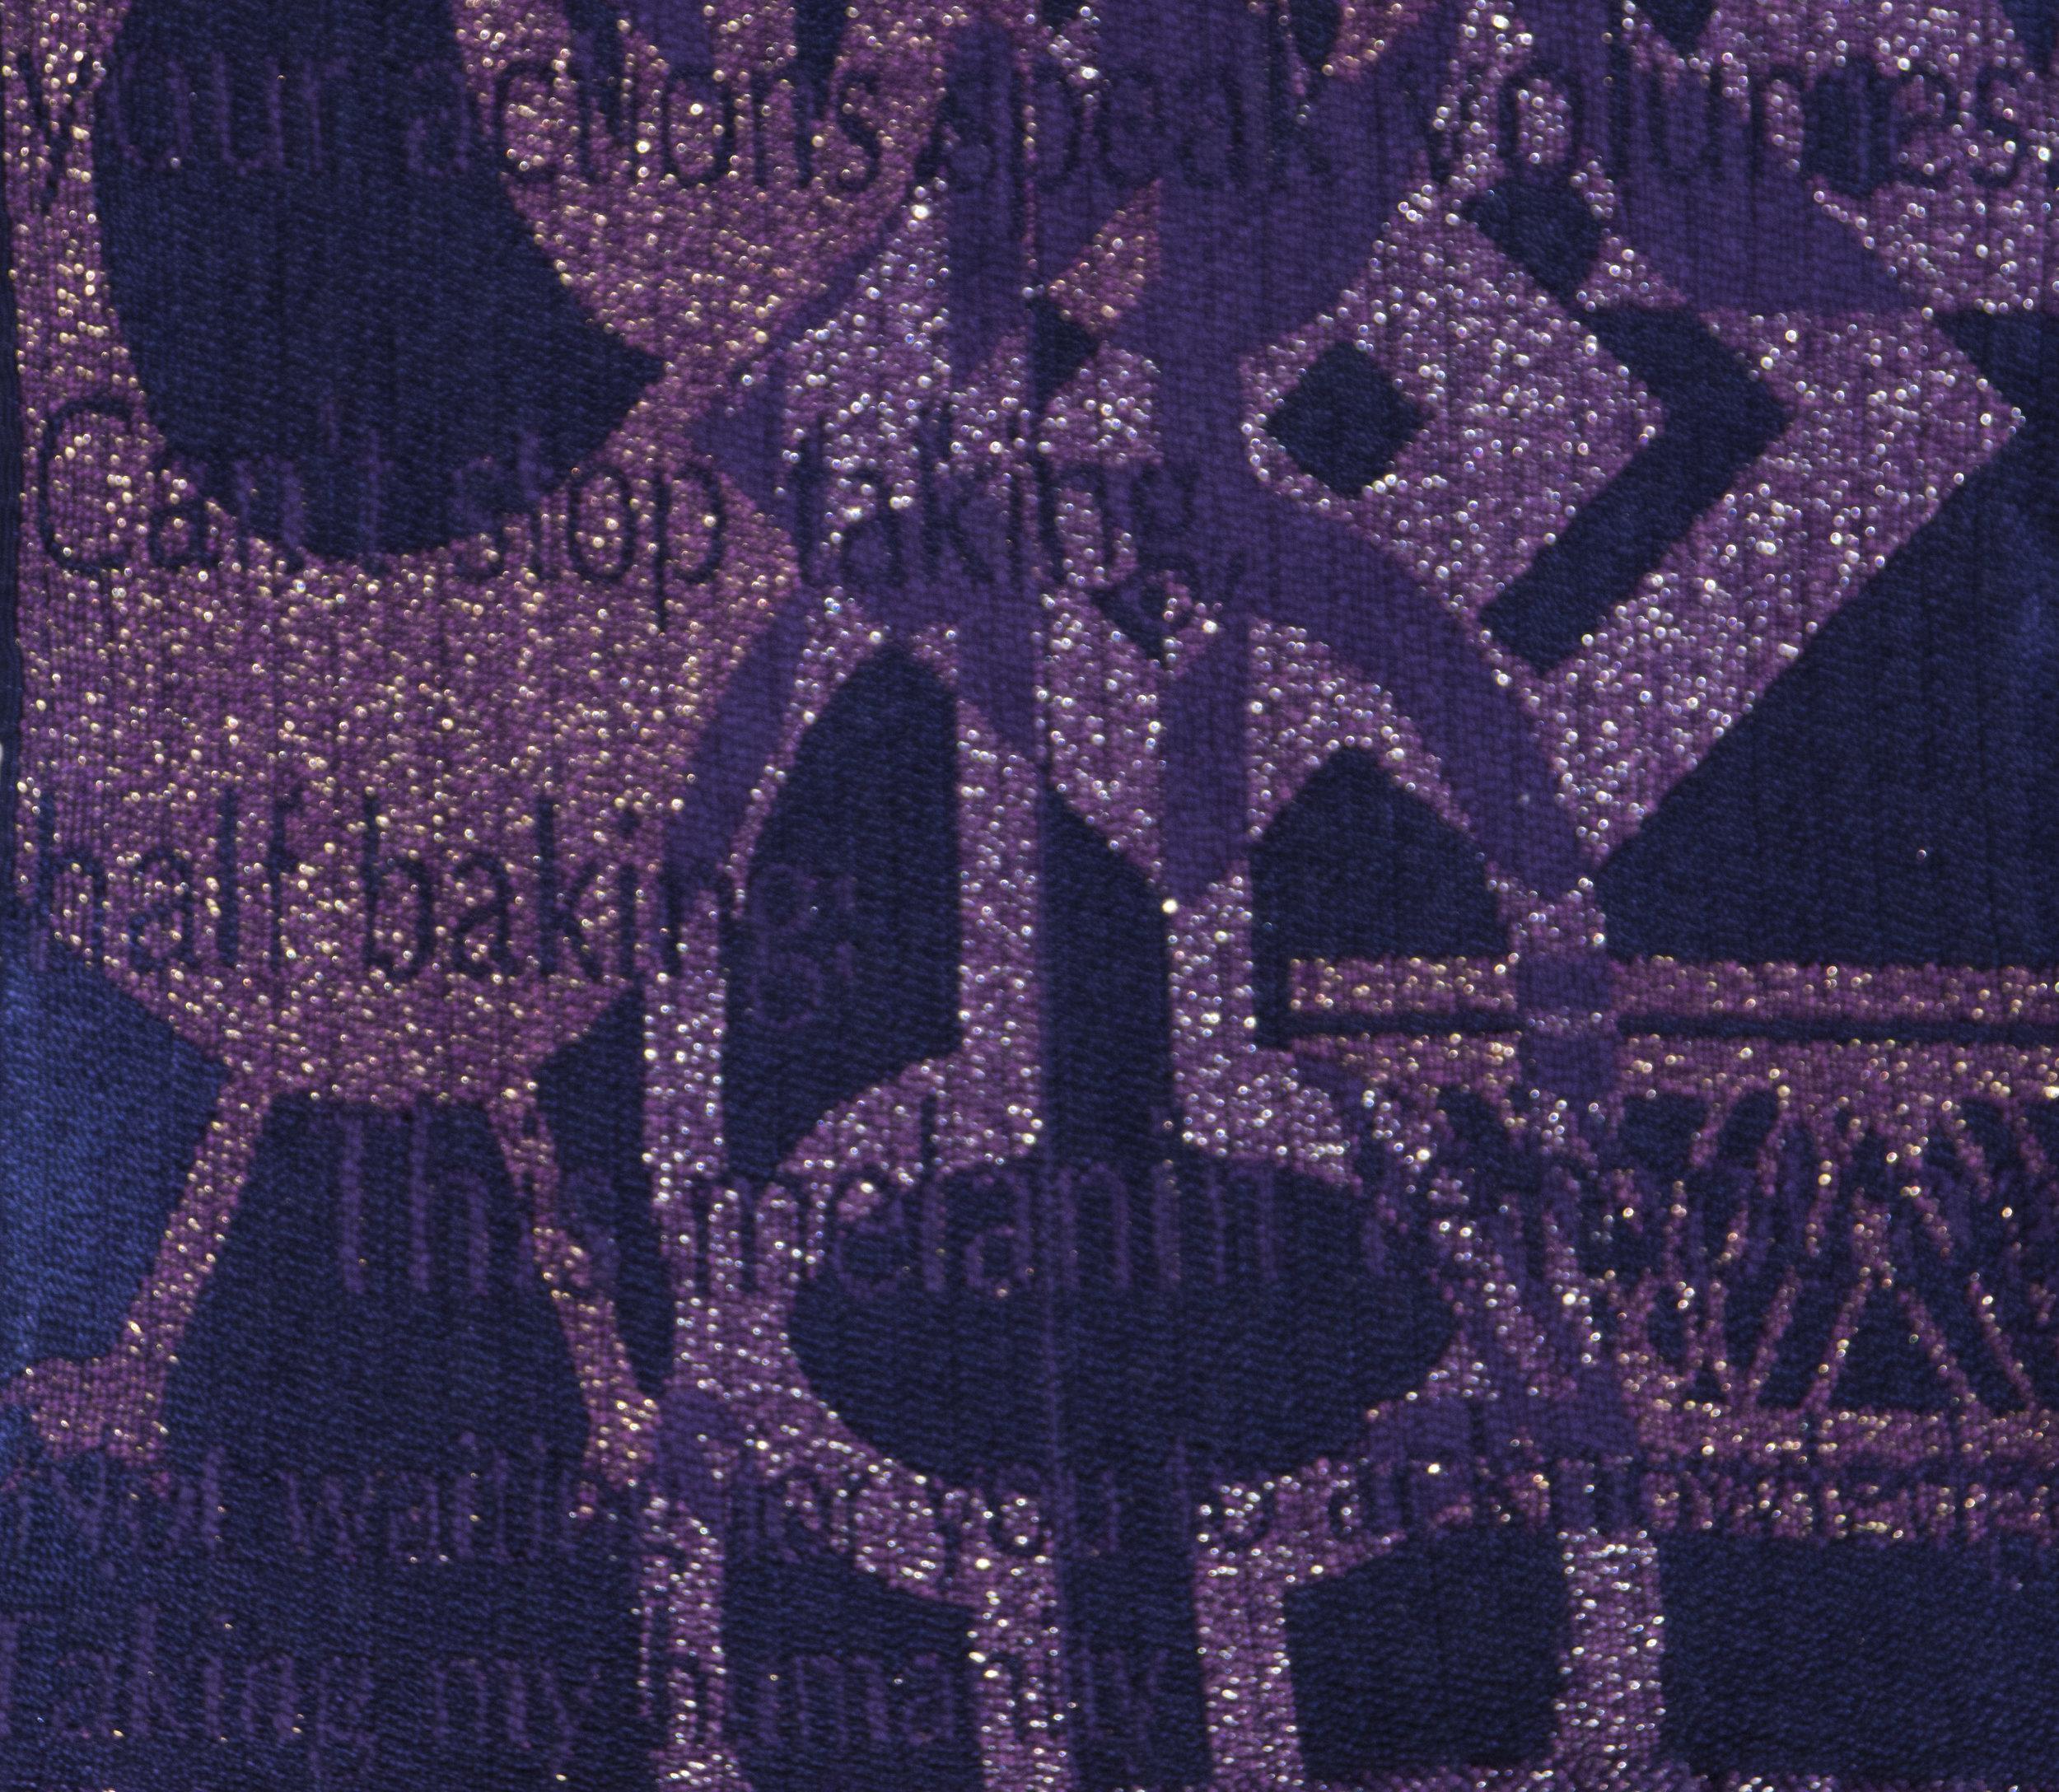 Blown Dissonance (detail purple)